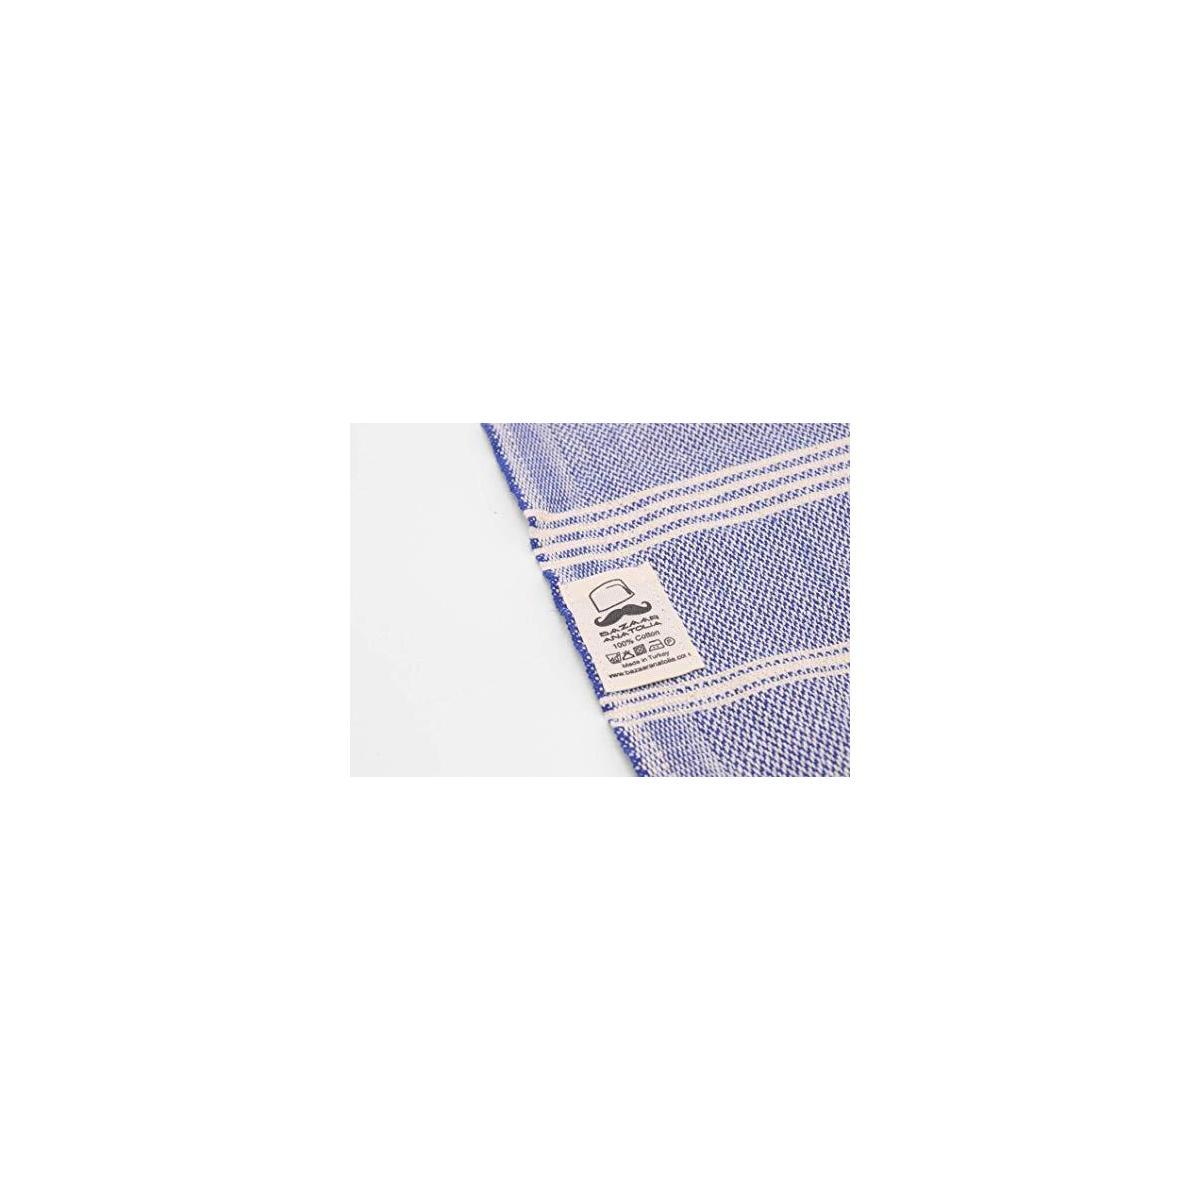 Hand Towel Set of 4 Peshtemal Towel 100% Cotton 45x20 (DARK BLUE)